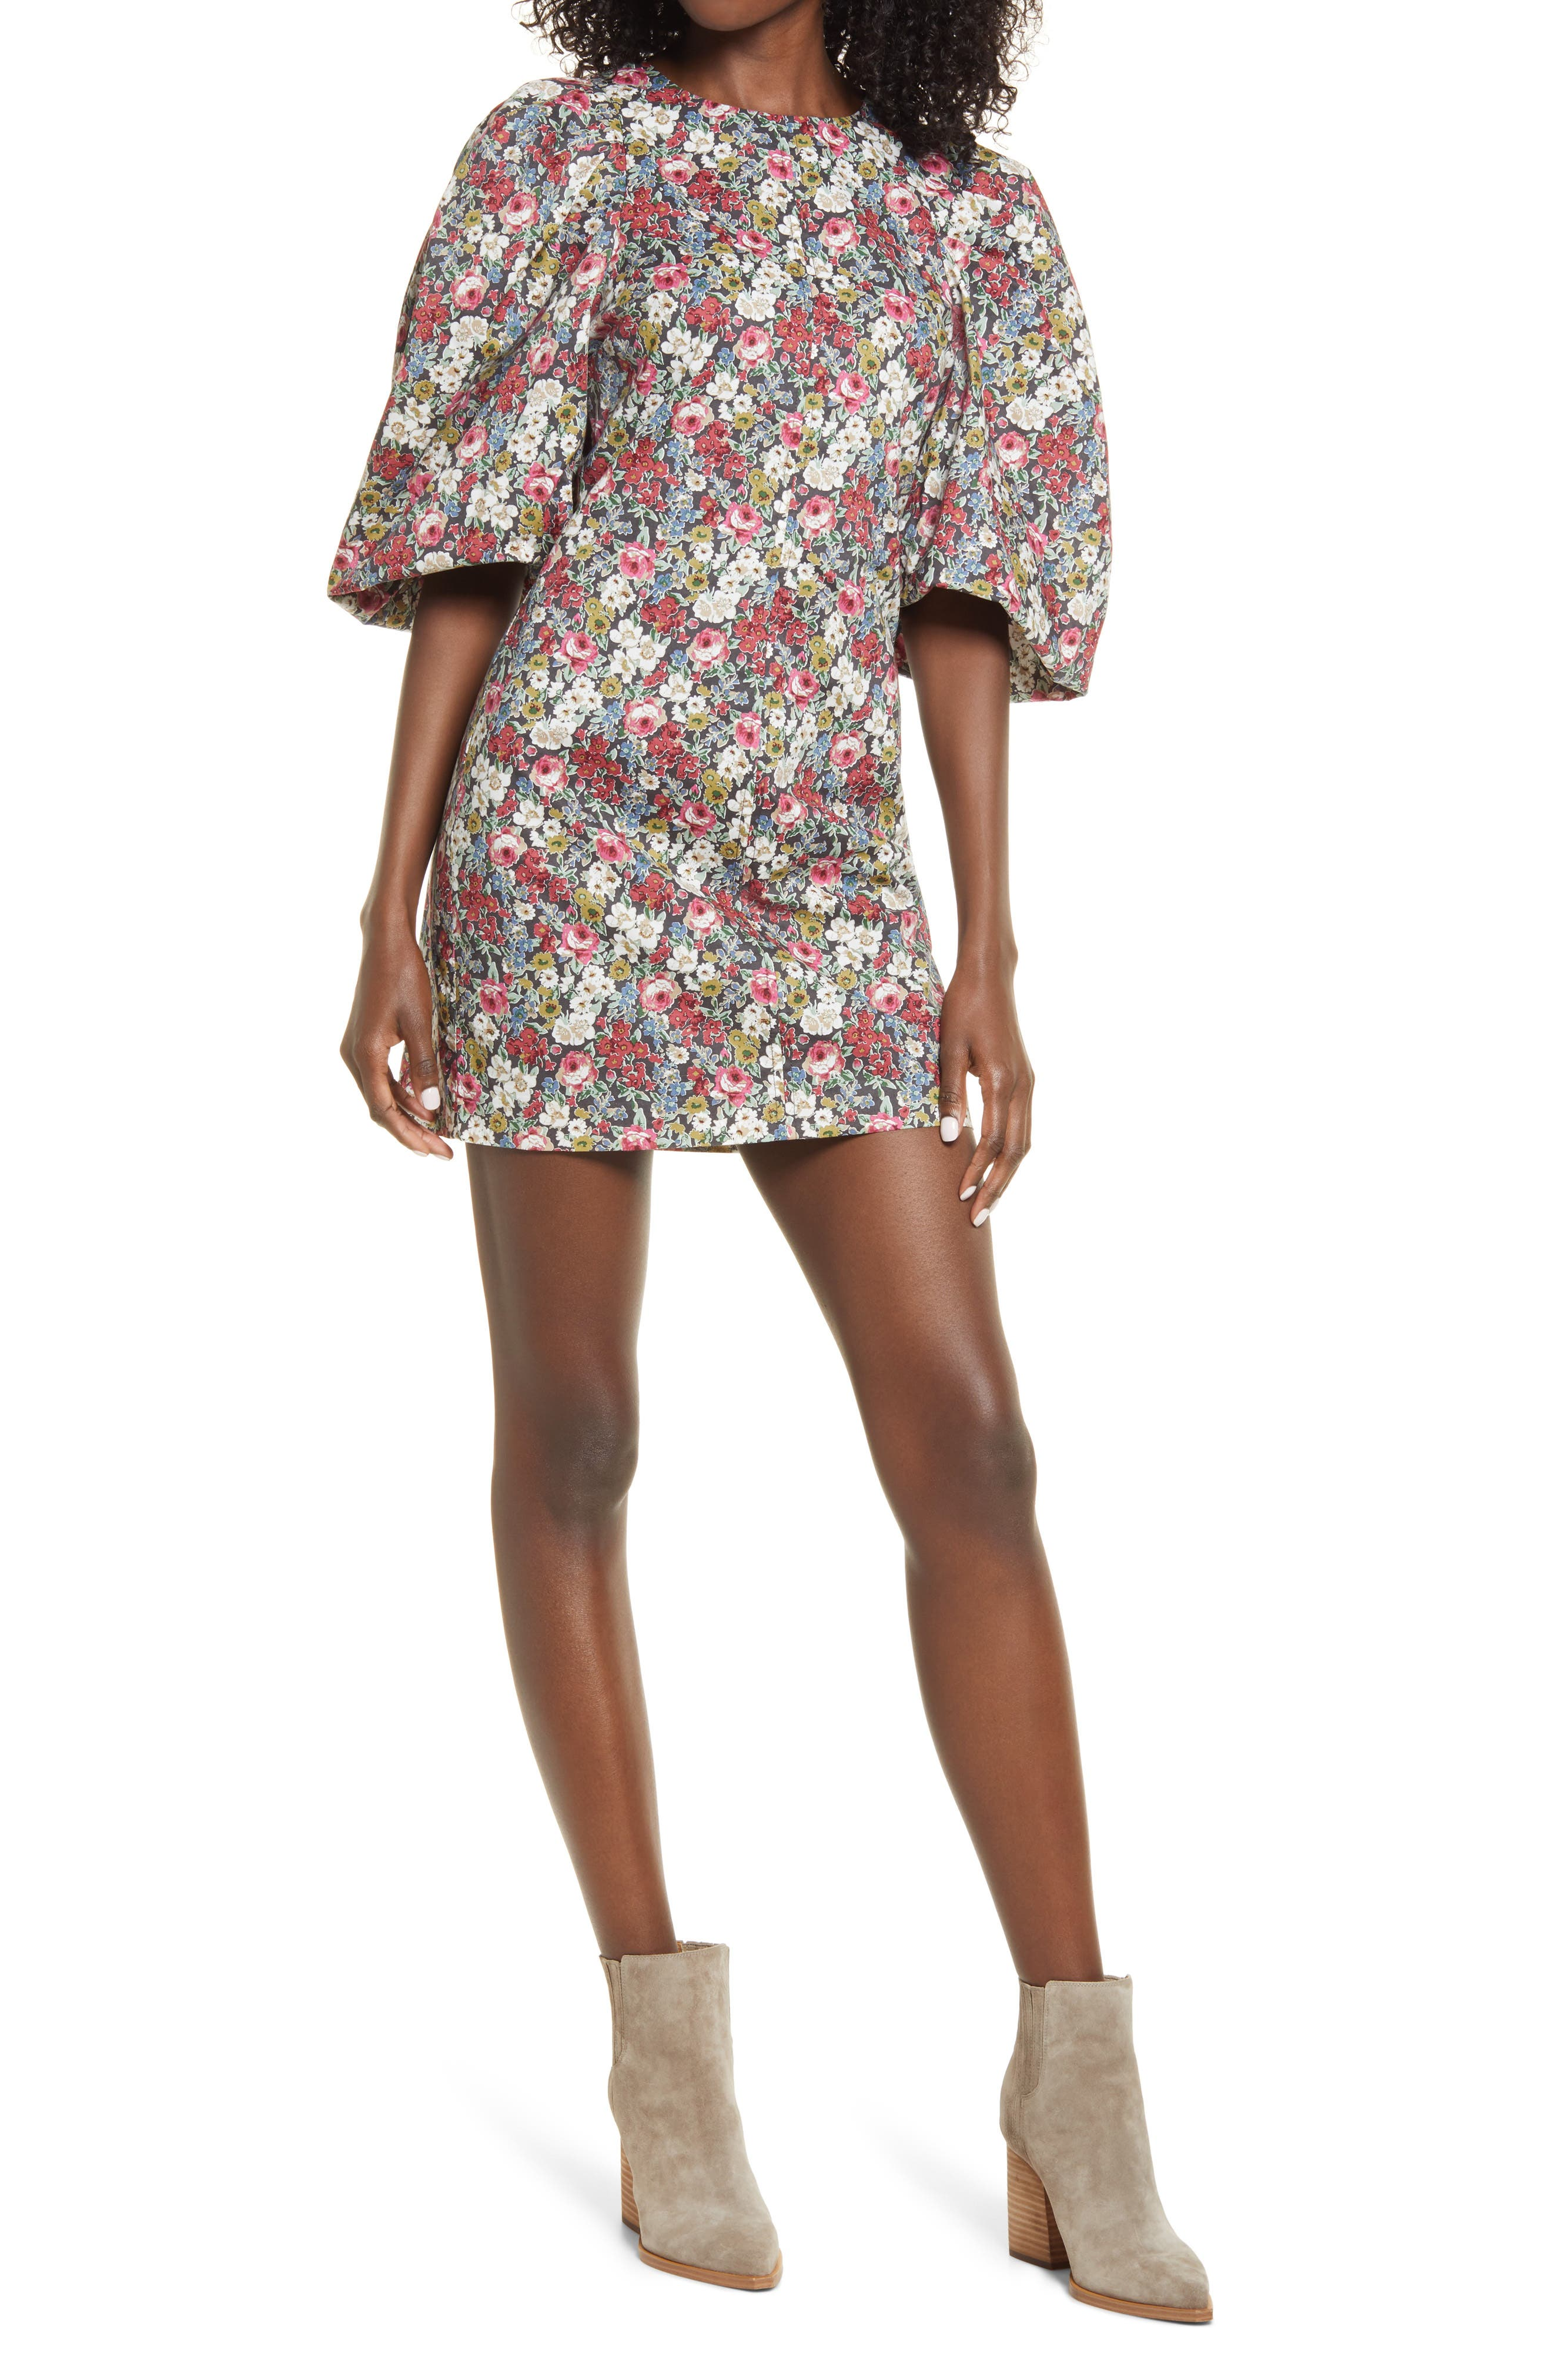 Endless Rose Women/'s Rose Romper Dress Green Gray Size Medium Lot 2